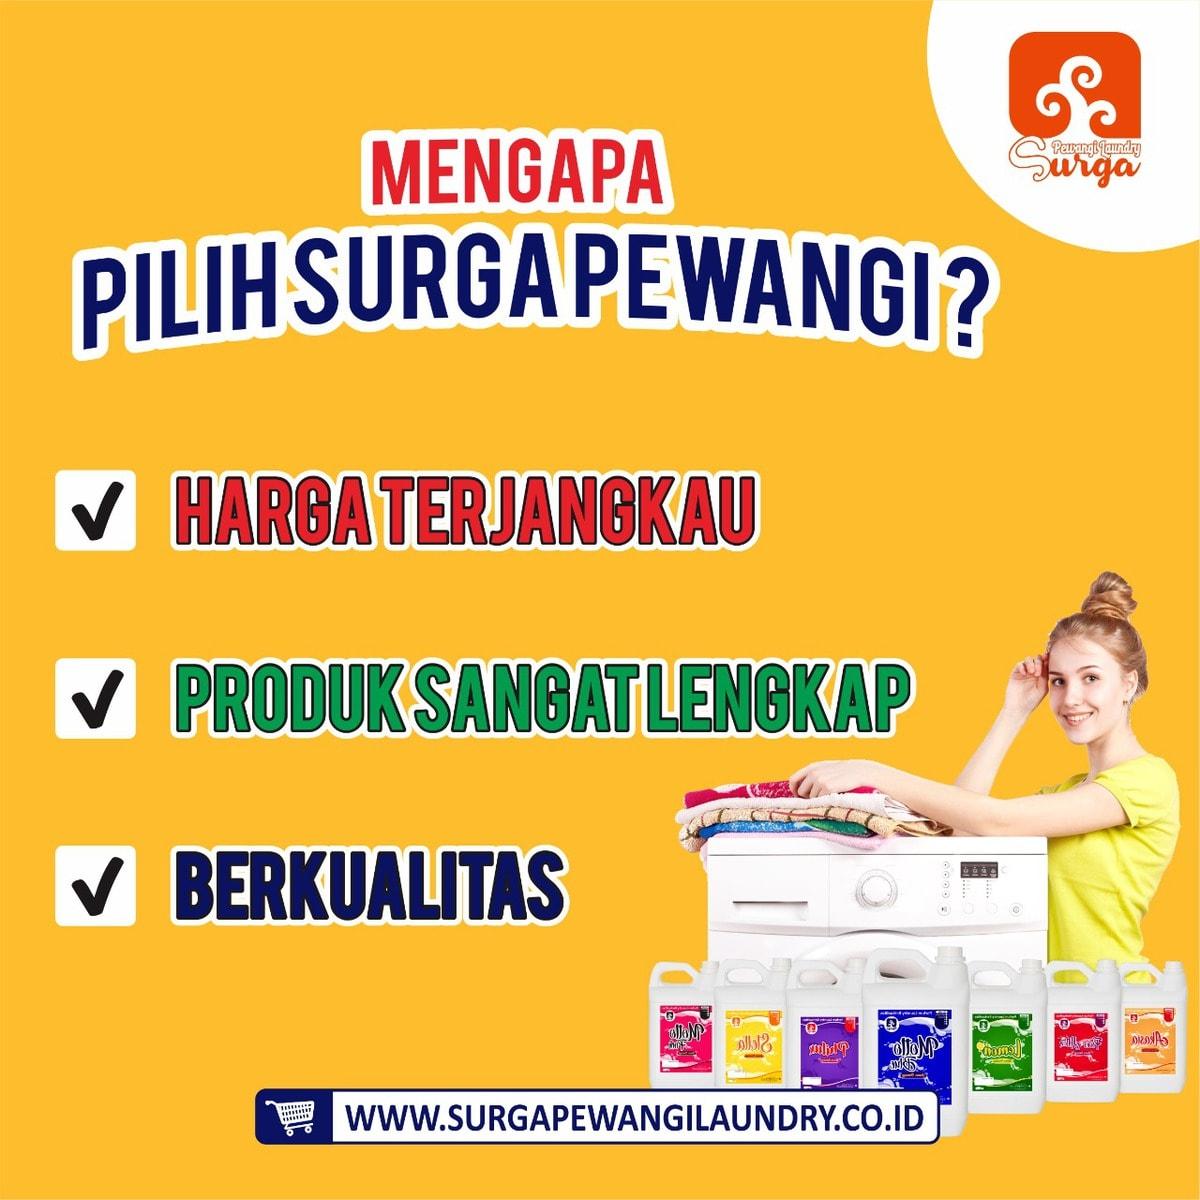 ebf47216 8c64 43f3 bb4b 872ccefbf35f - Parfum Laundry Legendaris Indonesia Paling Laris